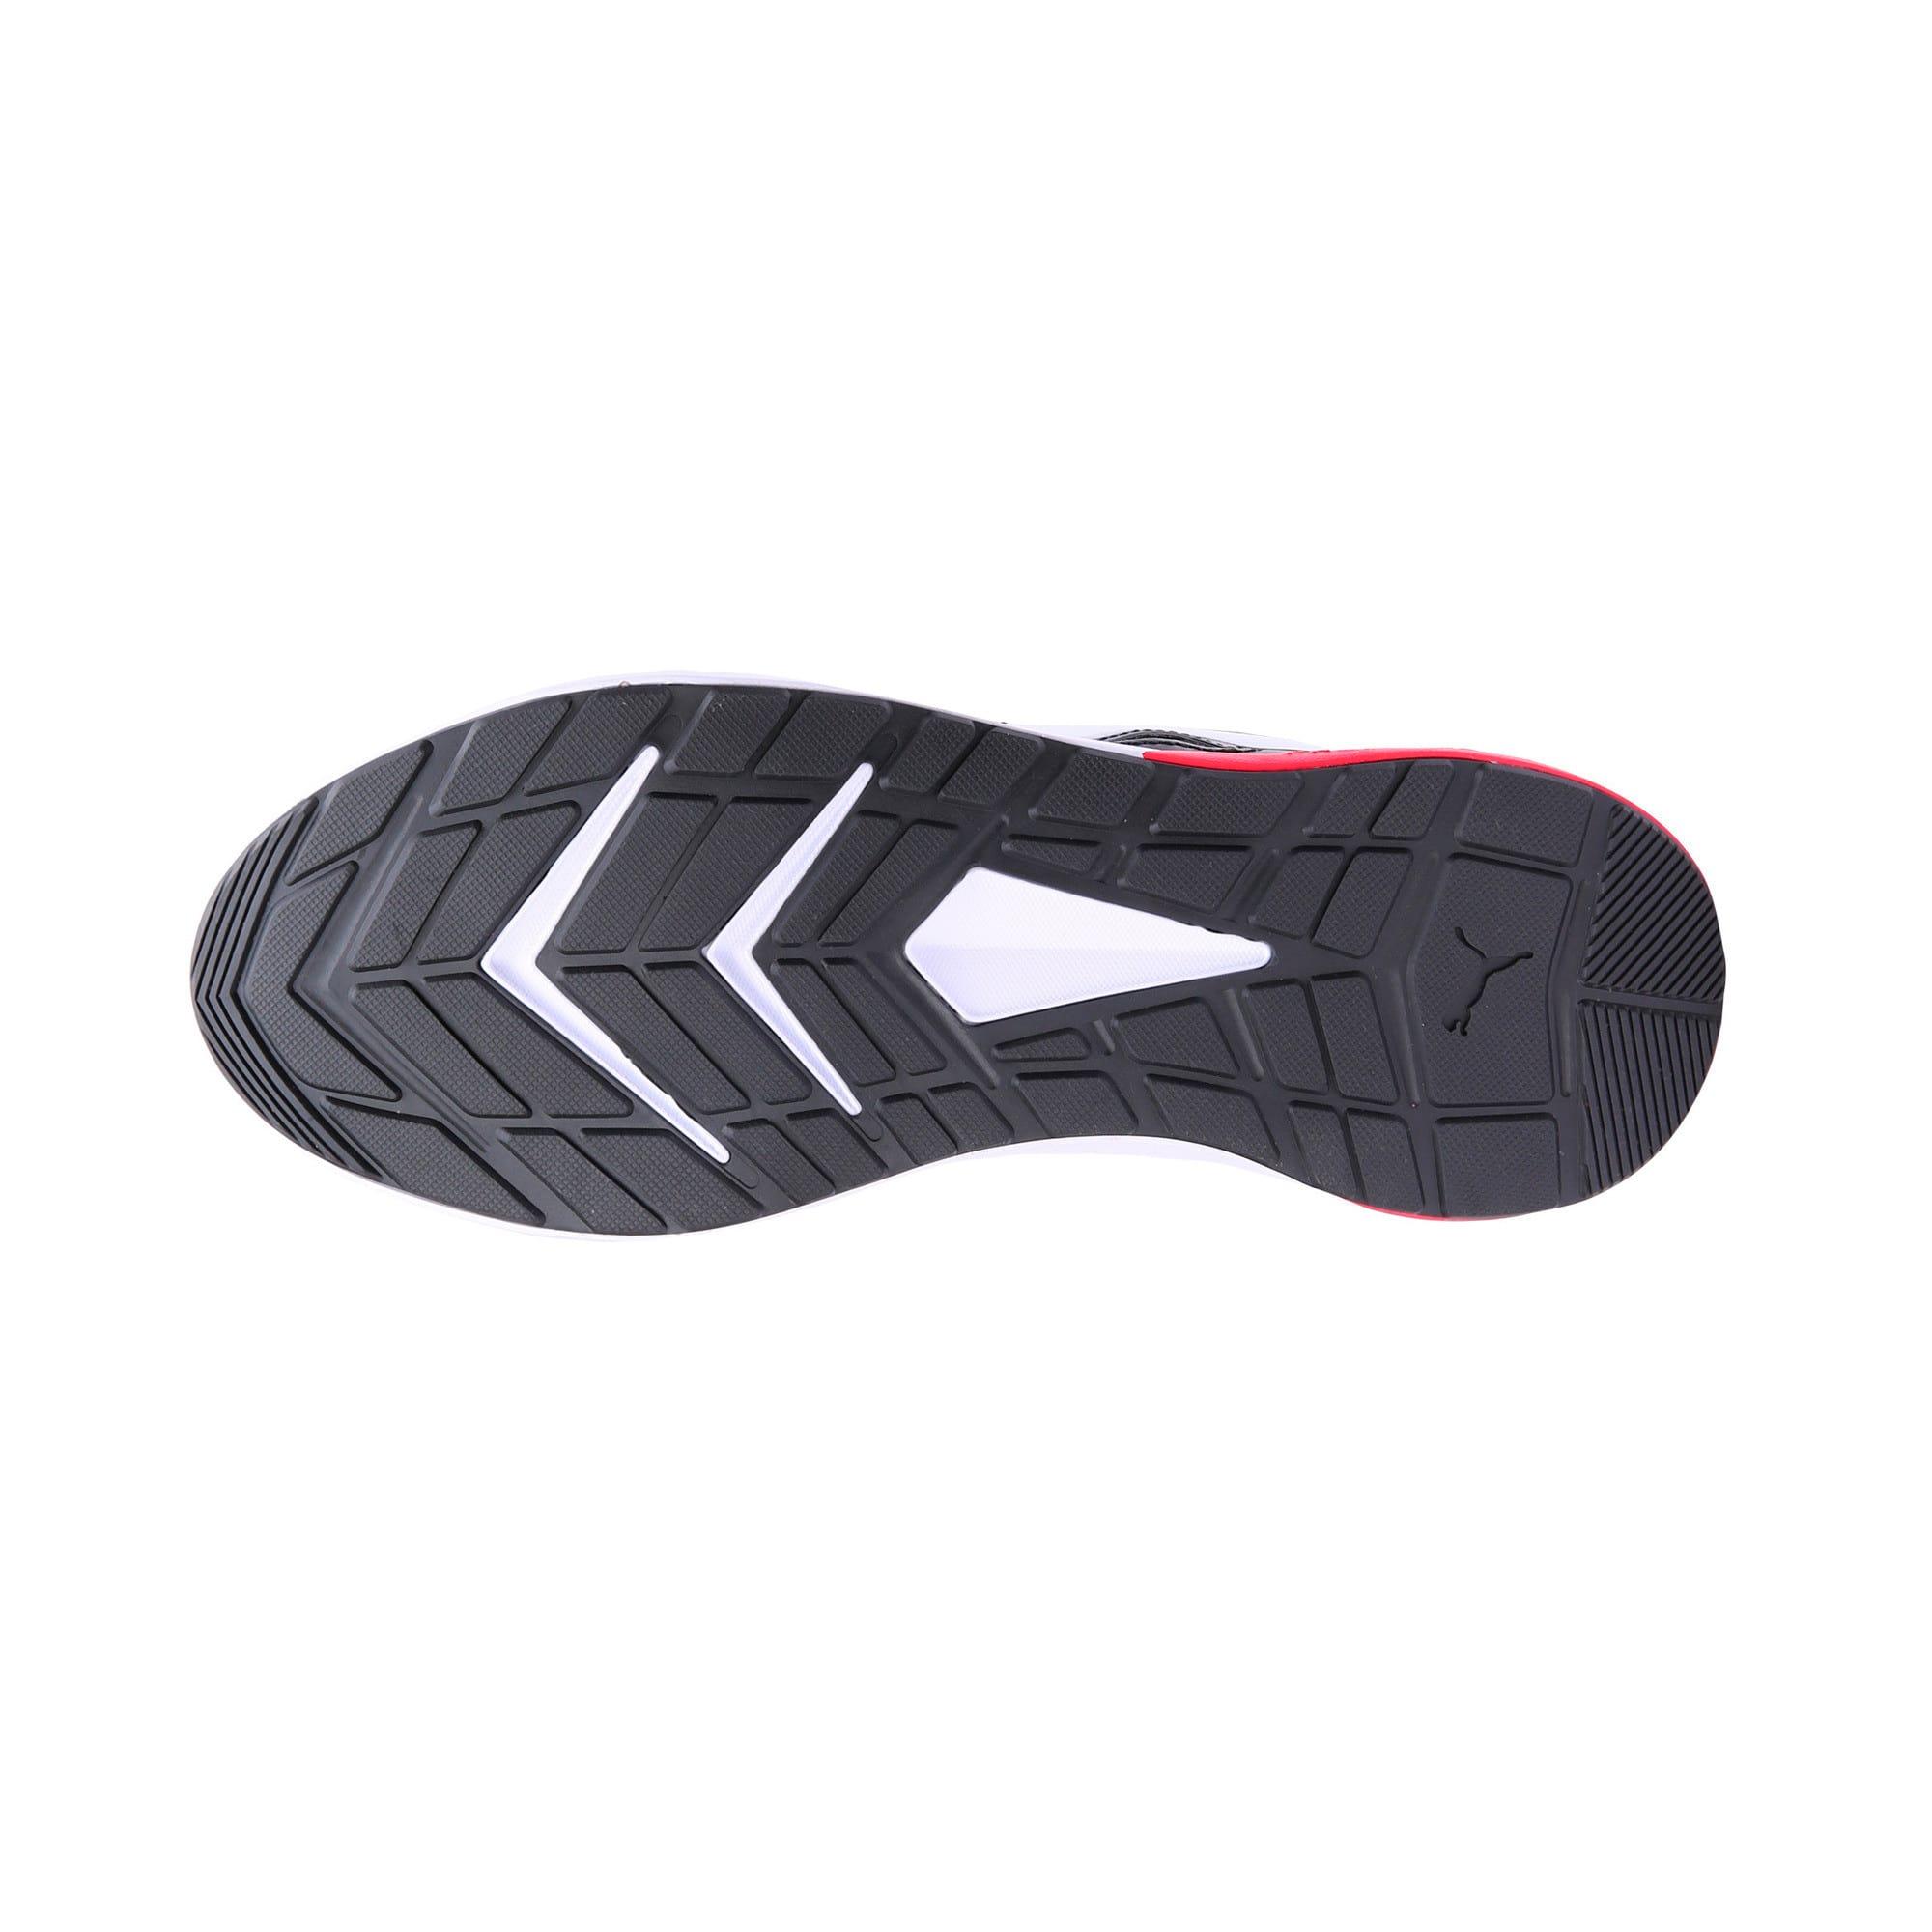 Thumbnail 4 of Escaper Tech Sneakers, P. Black-P. White-Fl.Scarlet, medium-IND